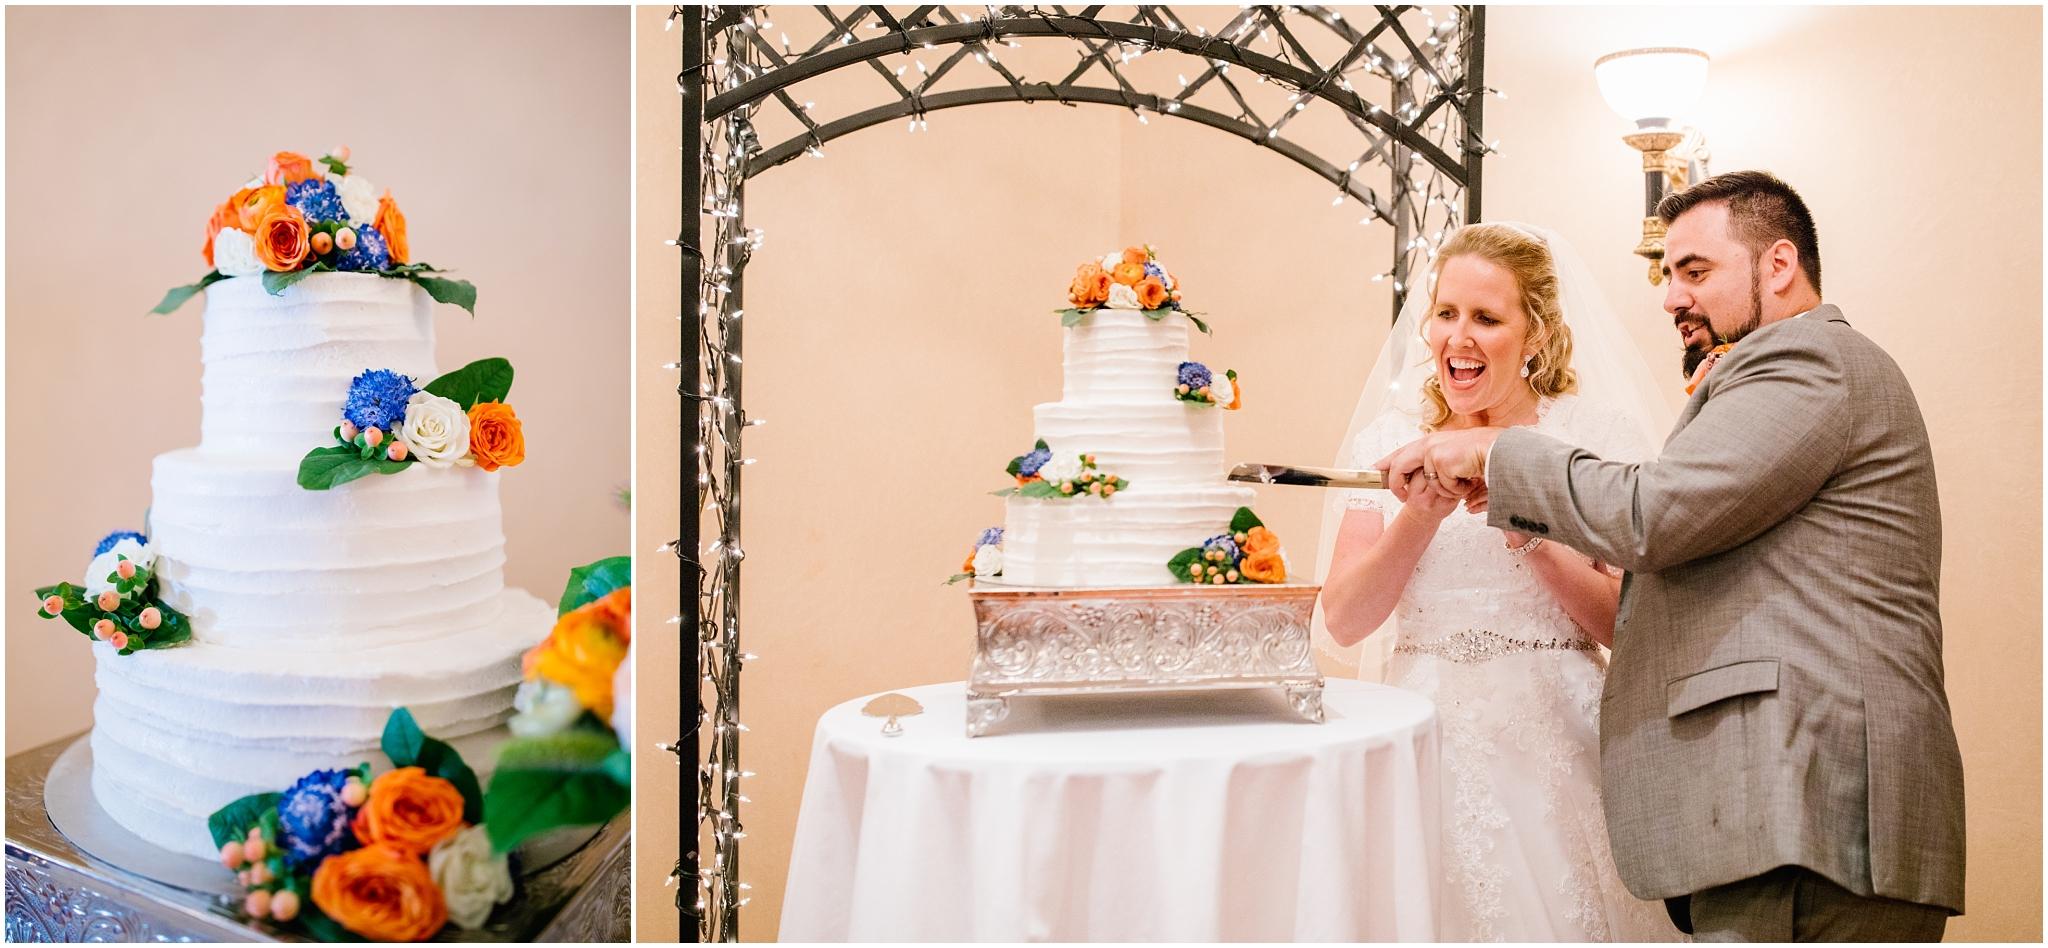 Justin and Melissa-300_Lizzie-B-Imagery-Utah-Wedding-Photographer-Salt-Lake-City-Temple-The-Grand-Ballroom.jpg